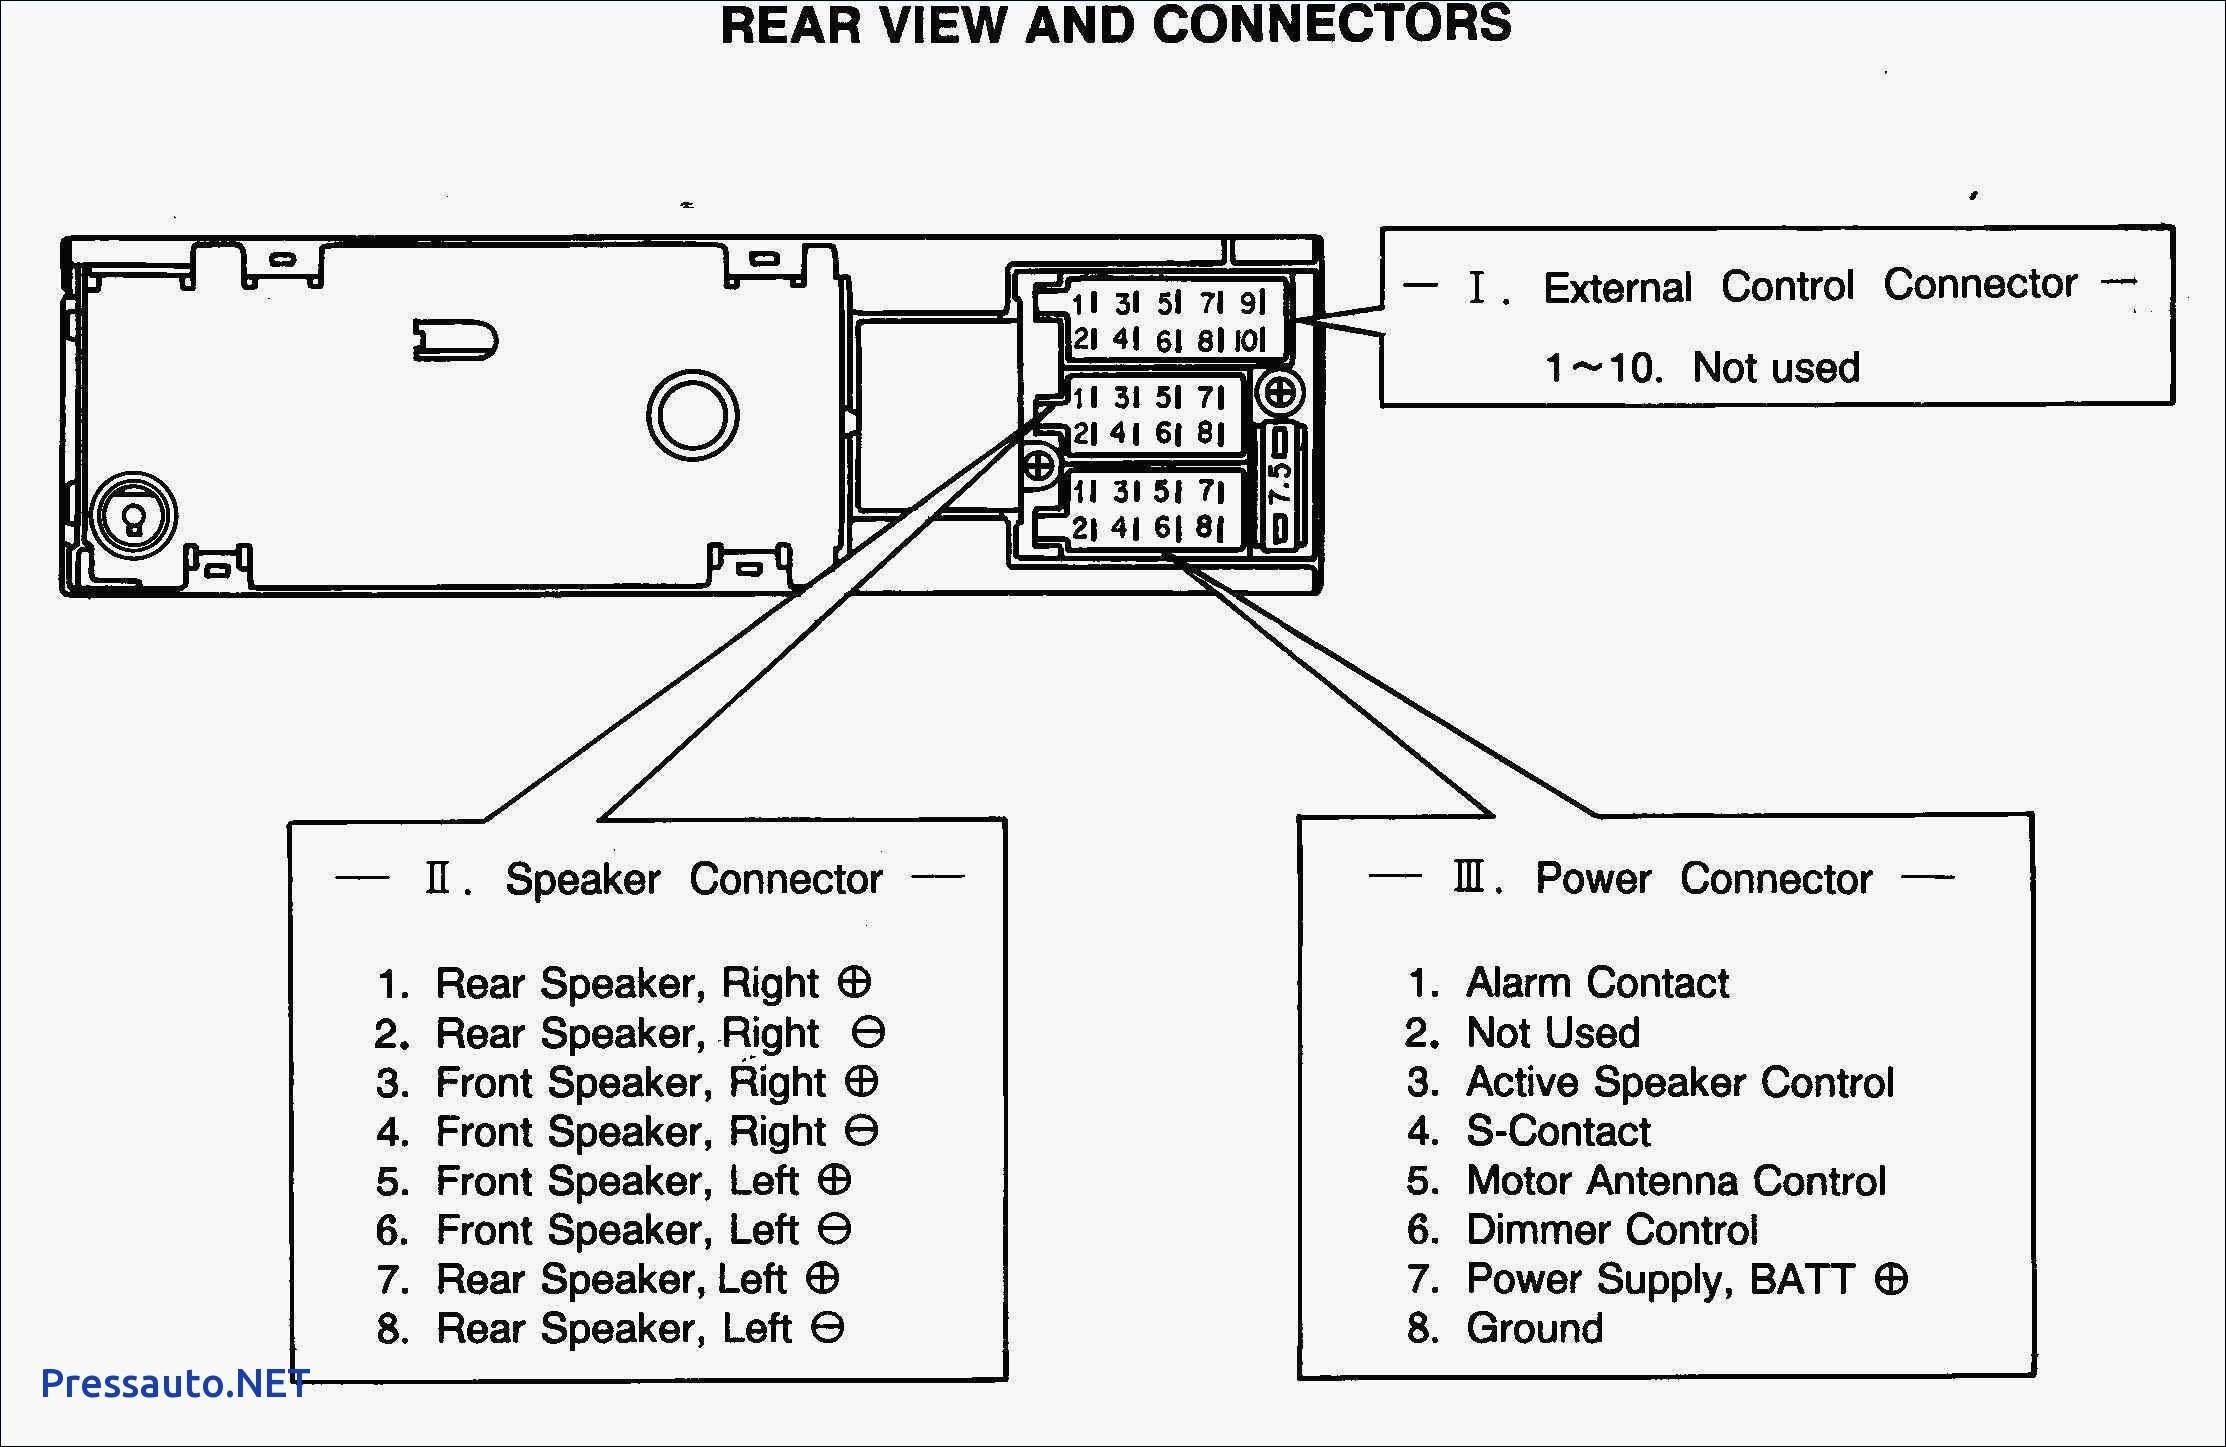 Audi Wiring Diagram 04 - Wiring Diagramsmove.psicologoafaenza.it